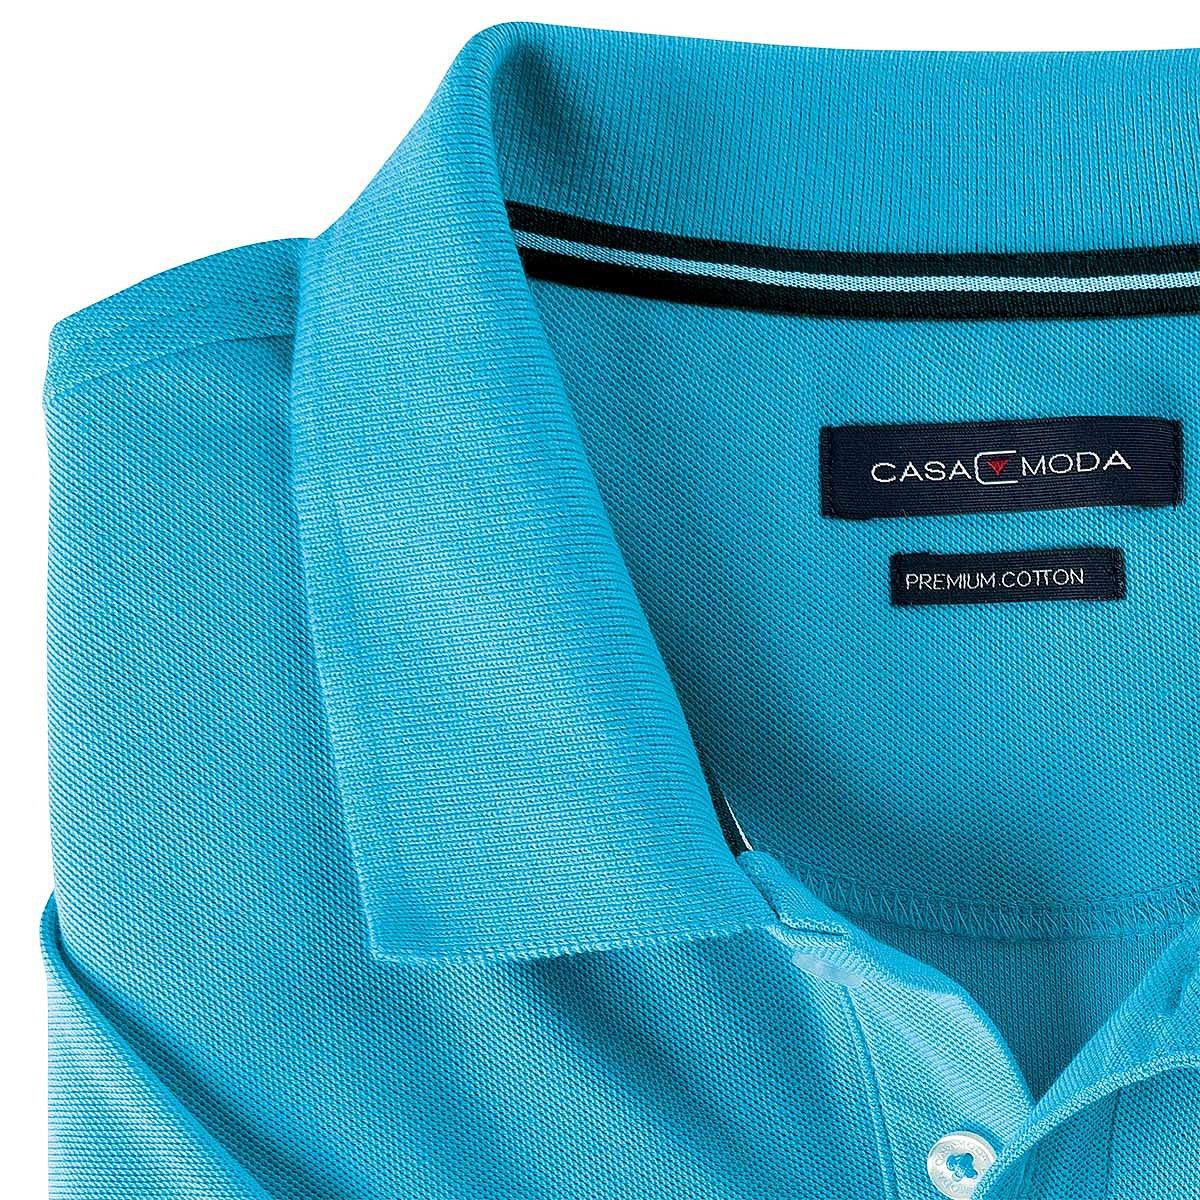 Casa Moda Polohemd Premium Cotton Farbe Hellblau